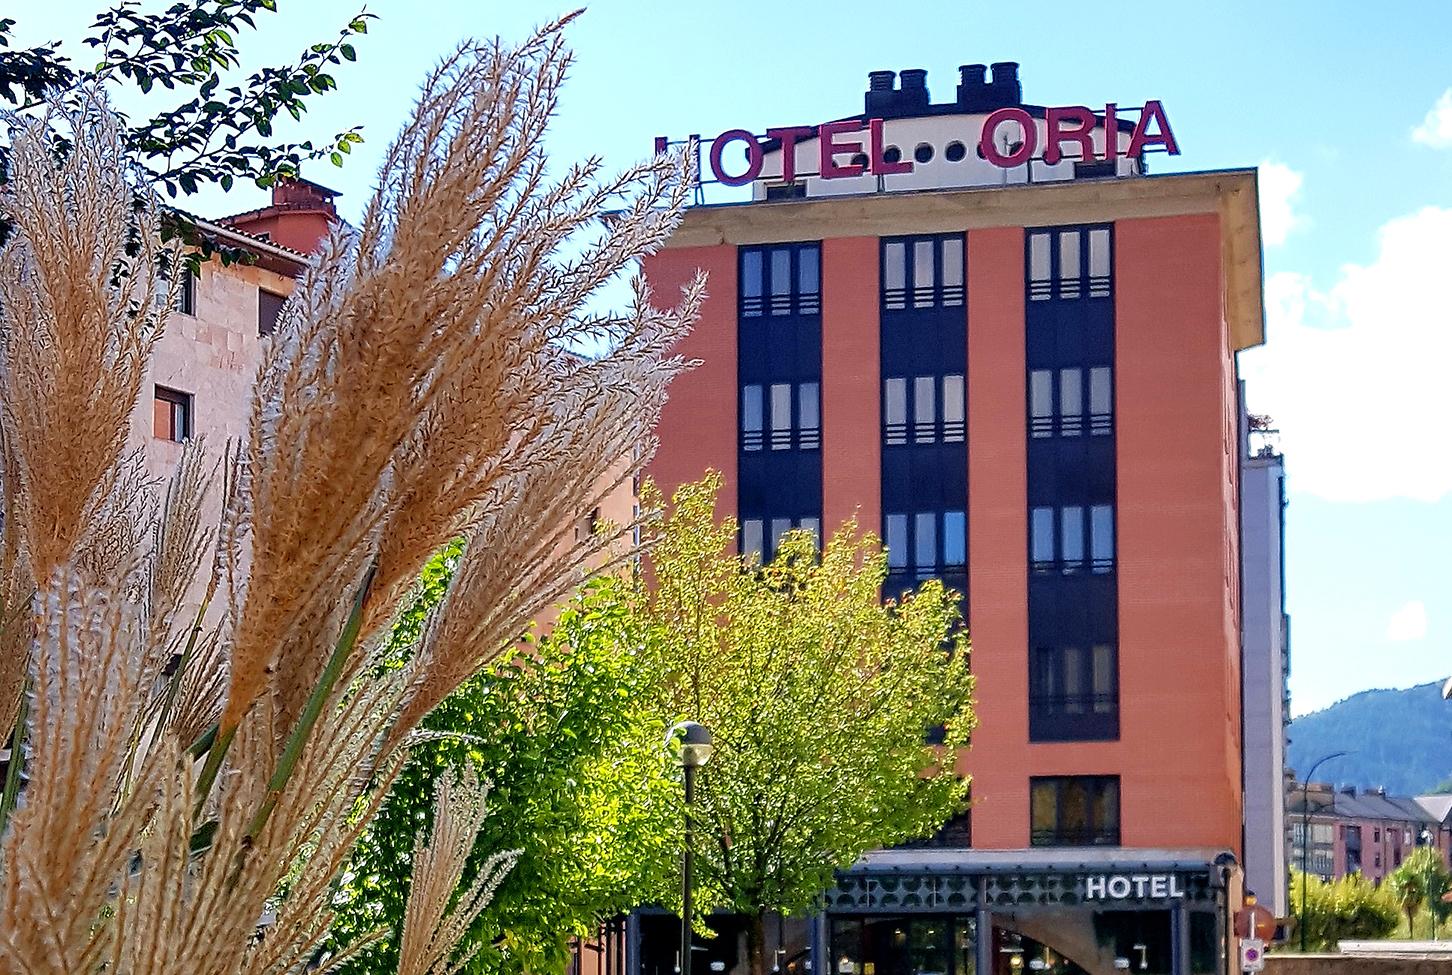 Fachada principal, Hotel Oria de Tolosa